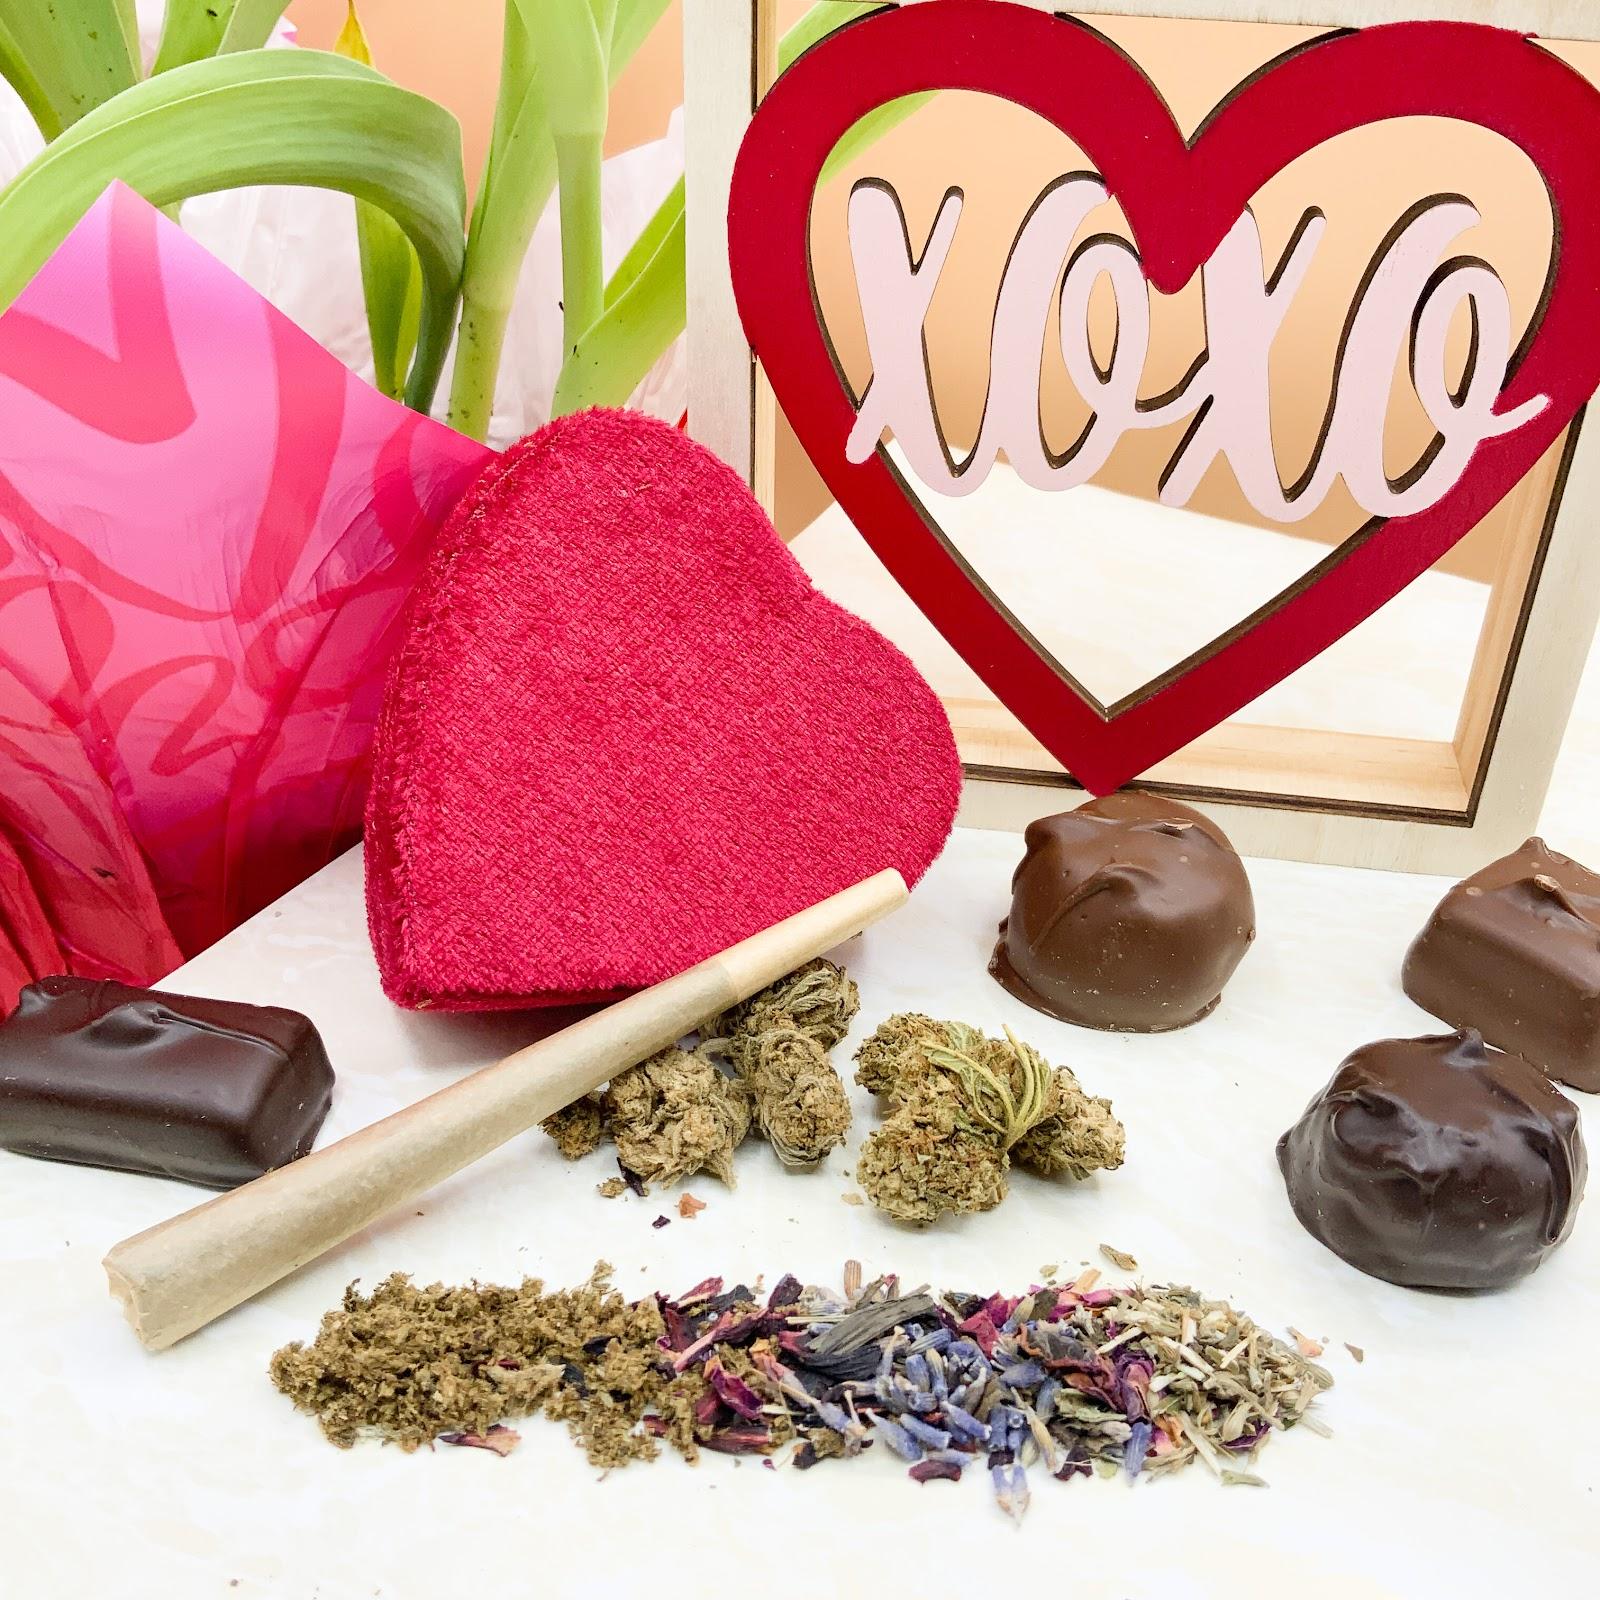 Smokable CBD Hemp Preroll for Valentine's Day